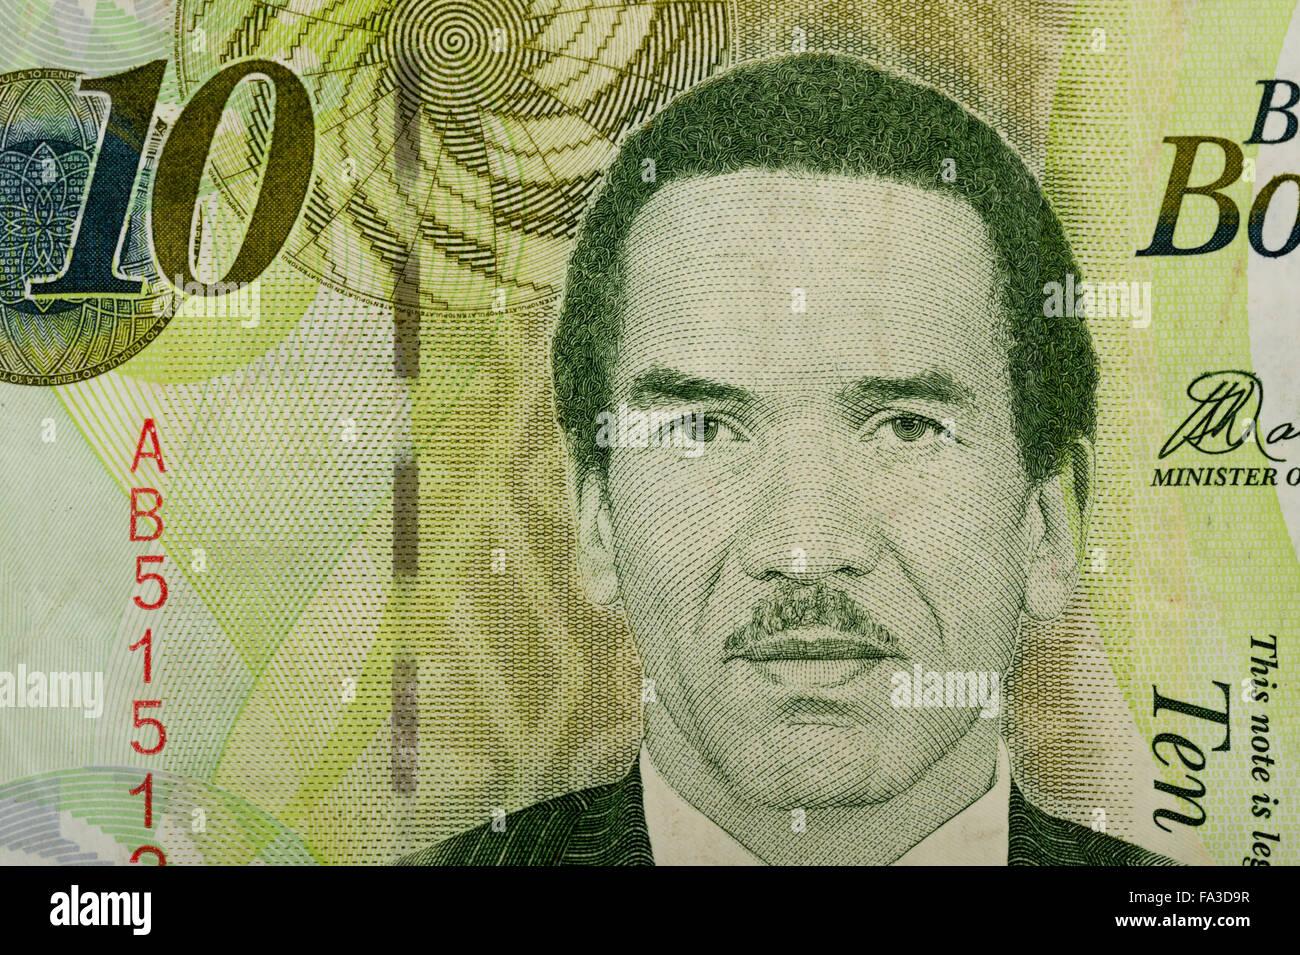 Pula Botswana Currency Stock Photos Pula Botswana Currency Stock